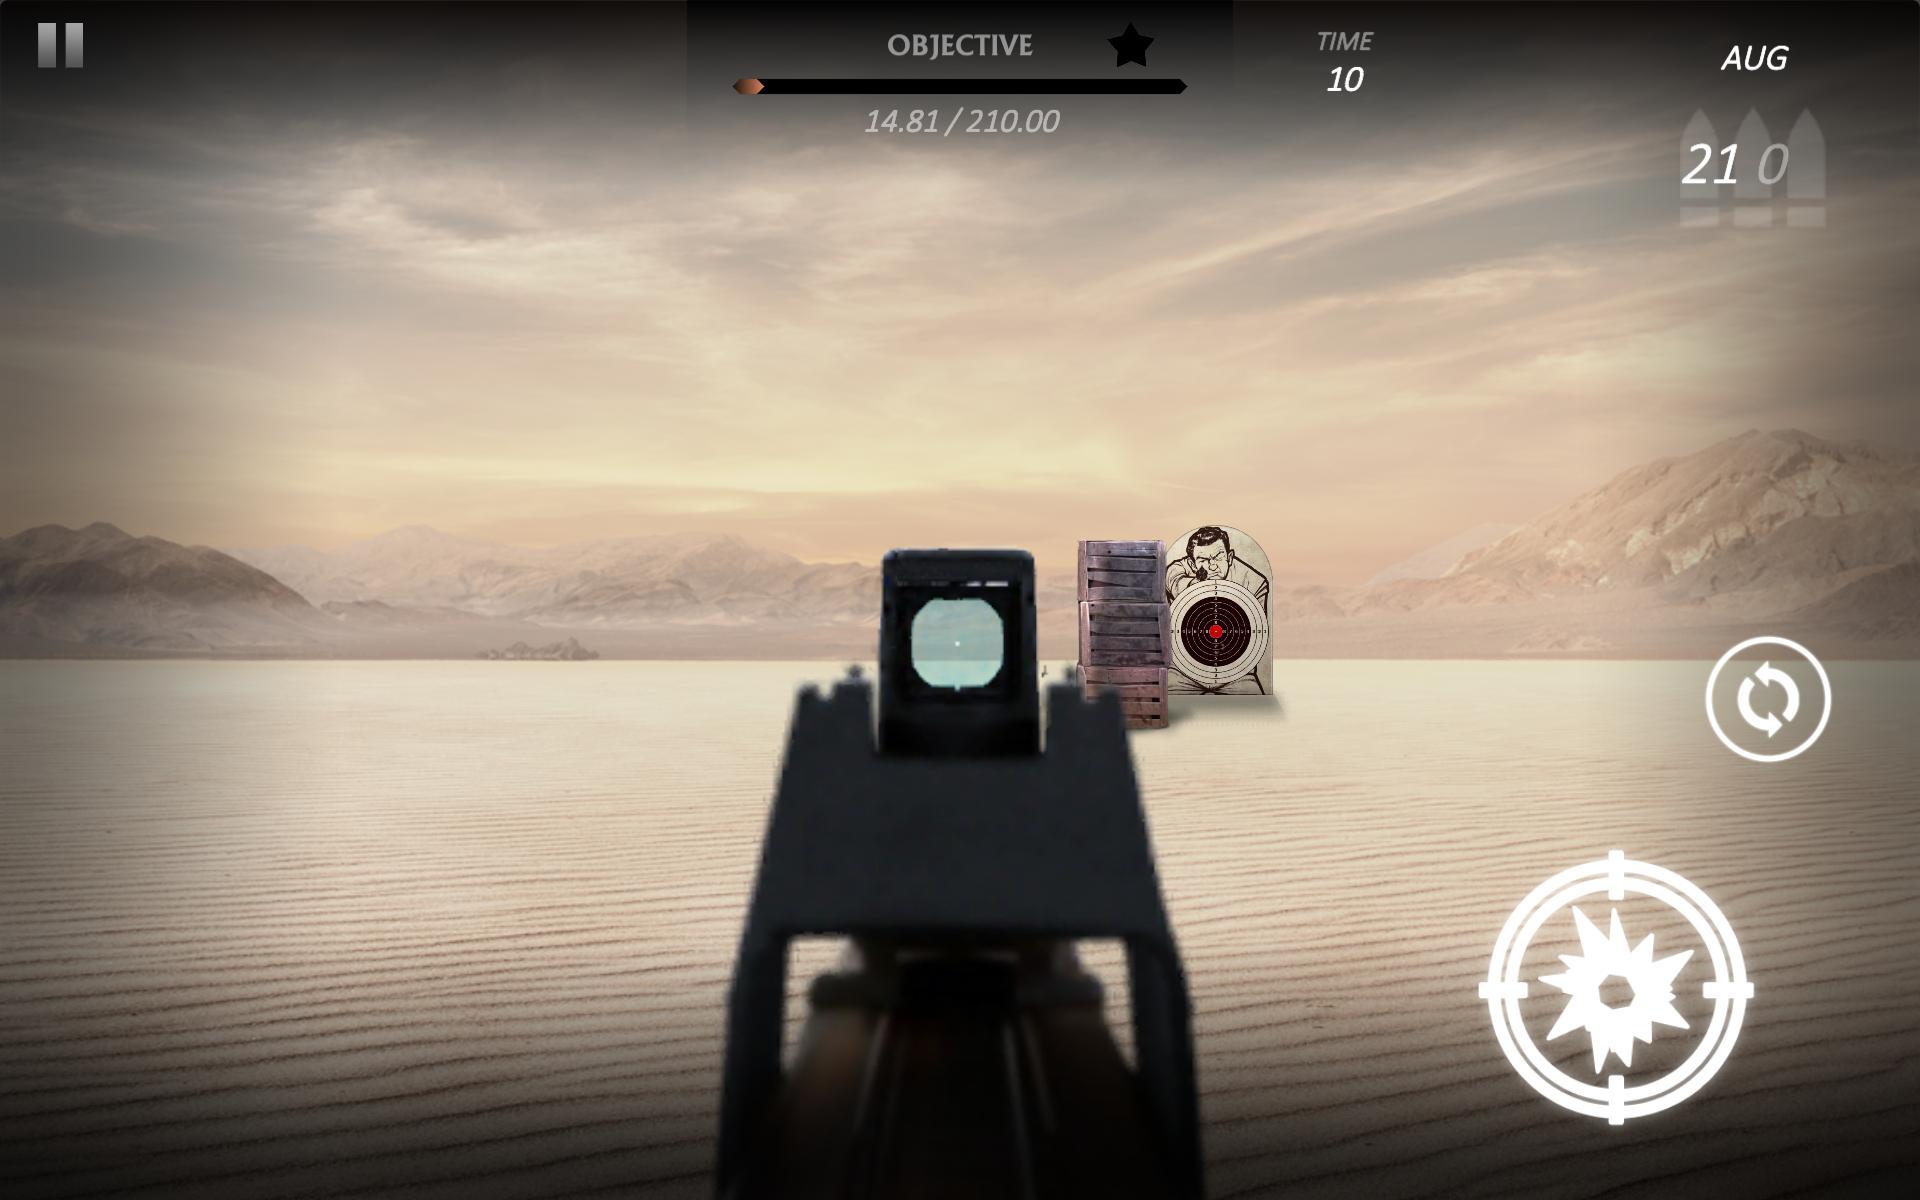 Canyon Shooting 2 - Free Shooting Range 3.0.6 Screenshot 15